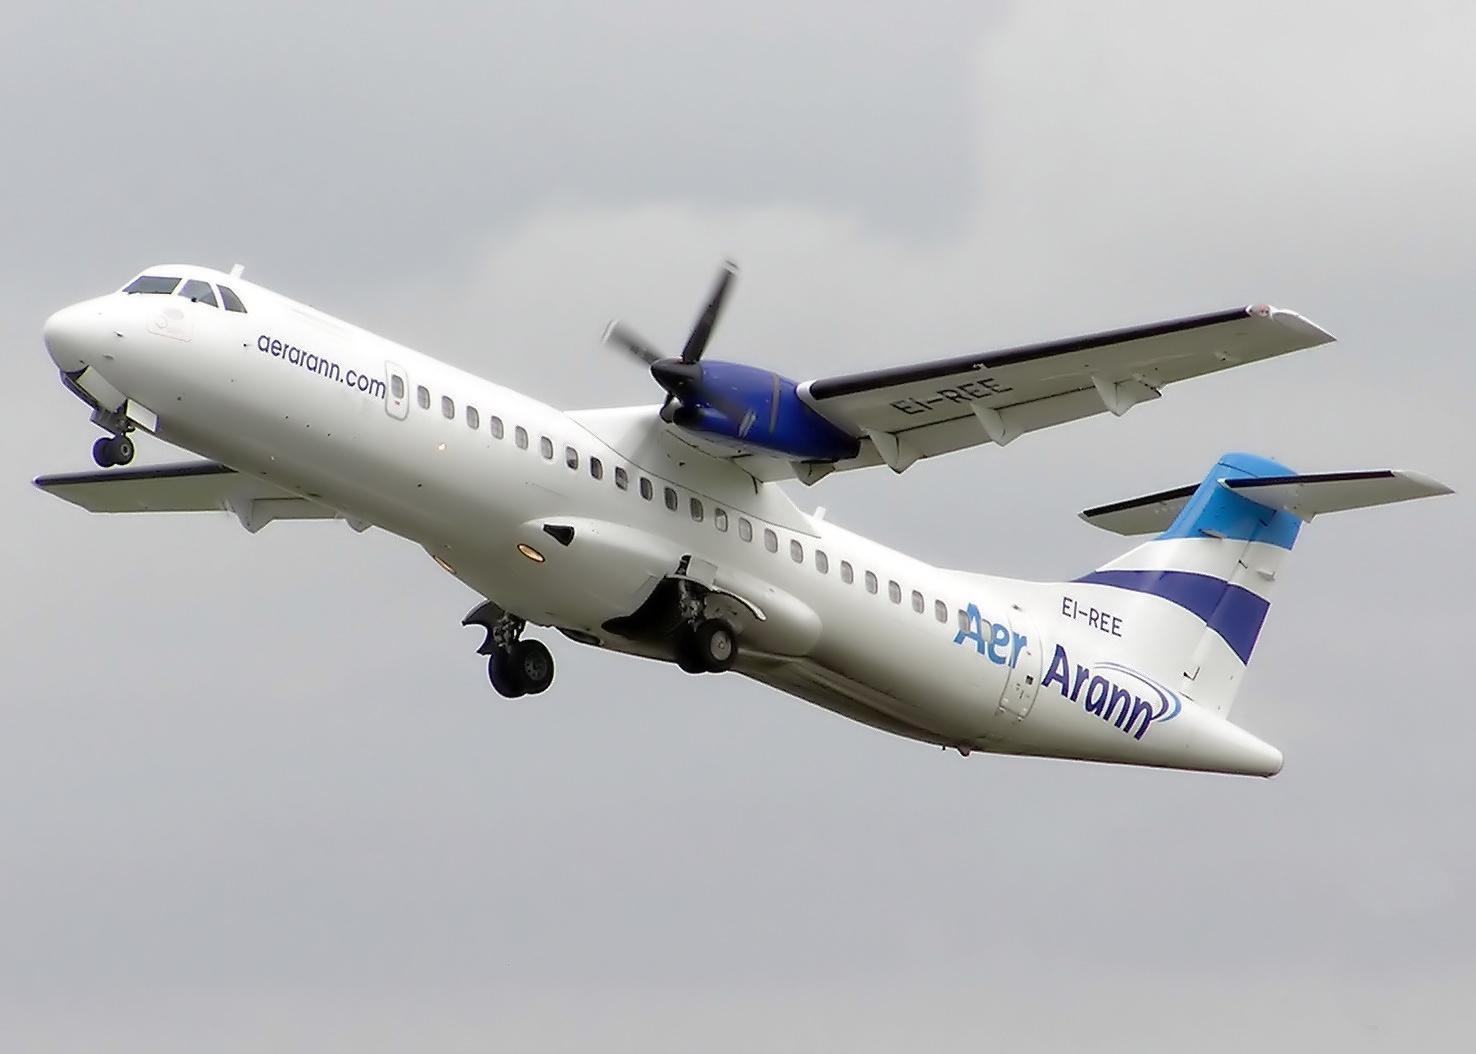 Aer_Arann_ATR-72_EI-REE_Bristol.jpg